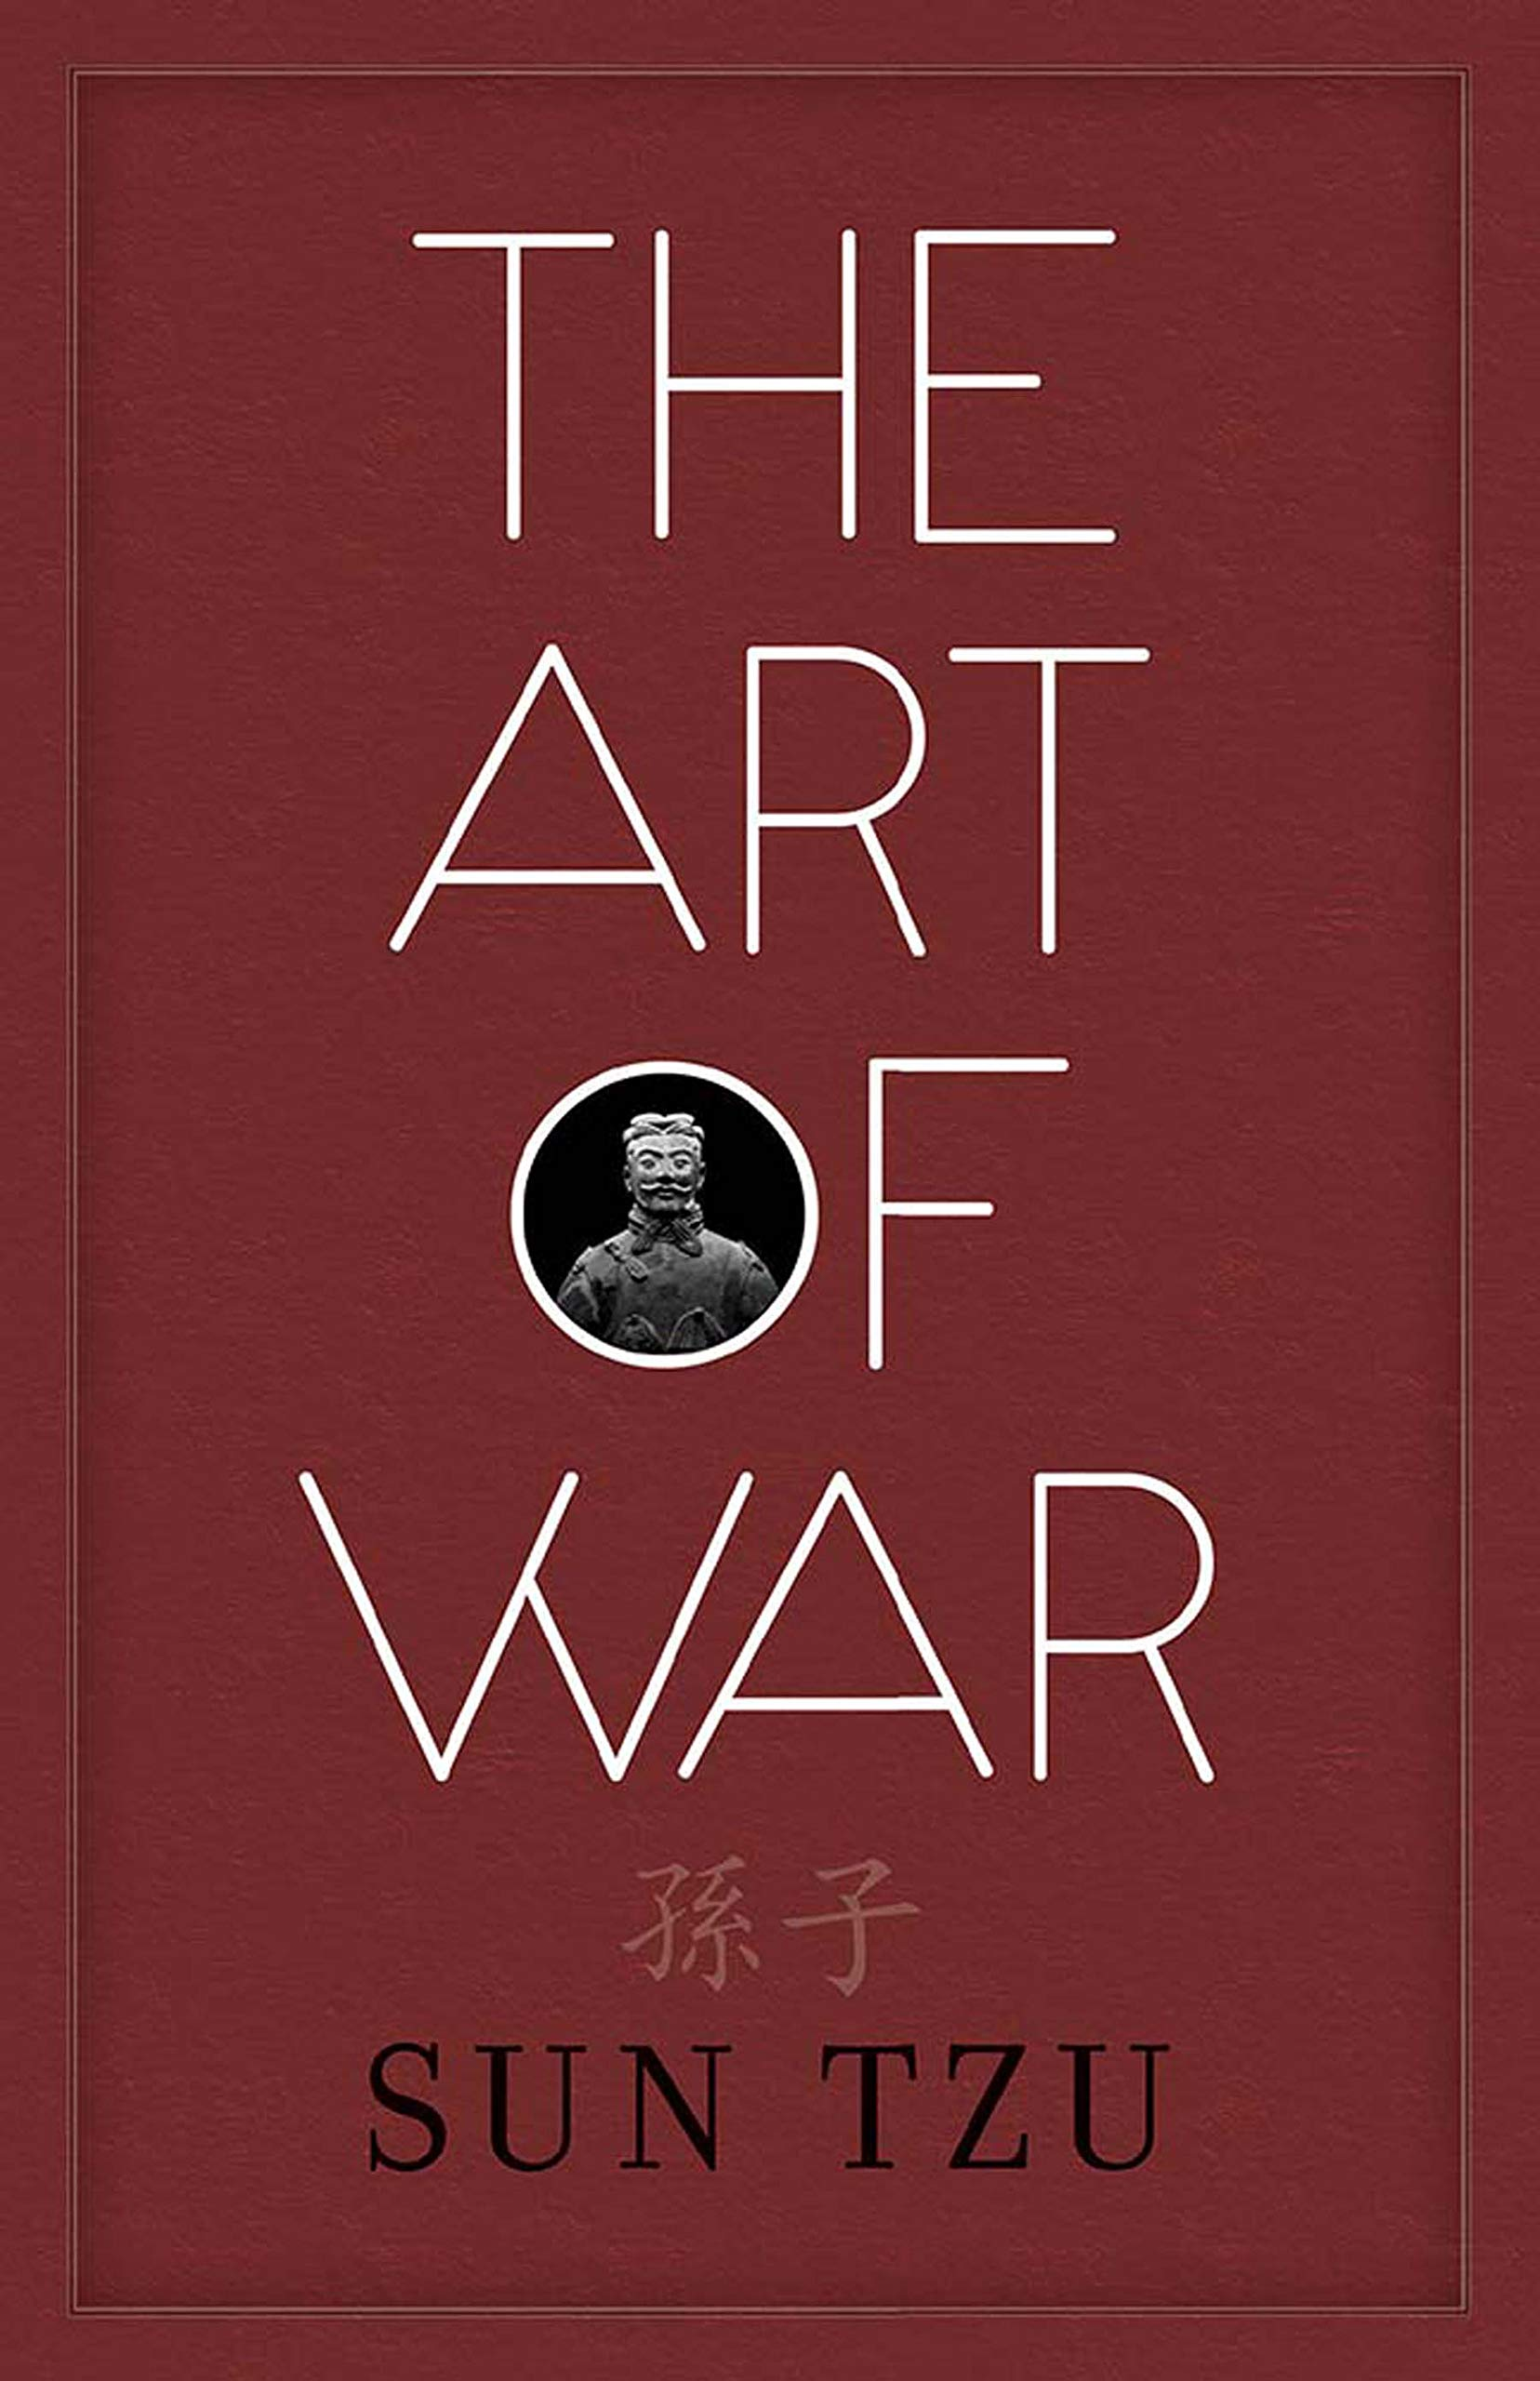 The Art of War: Sun Tzu: 0800759832941: Amazon.com: Books